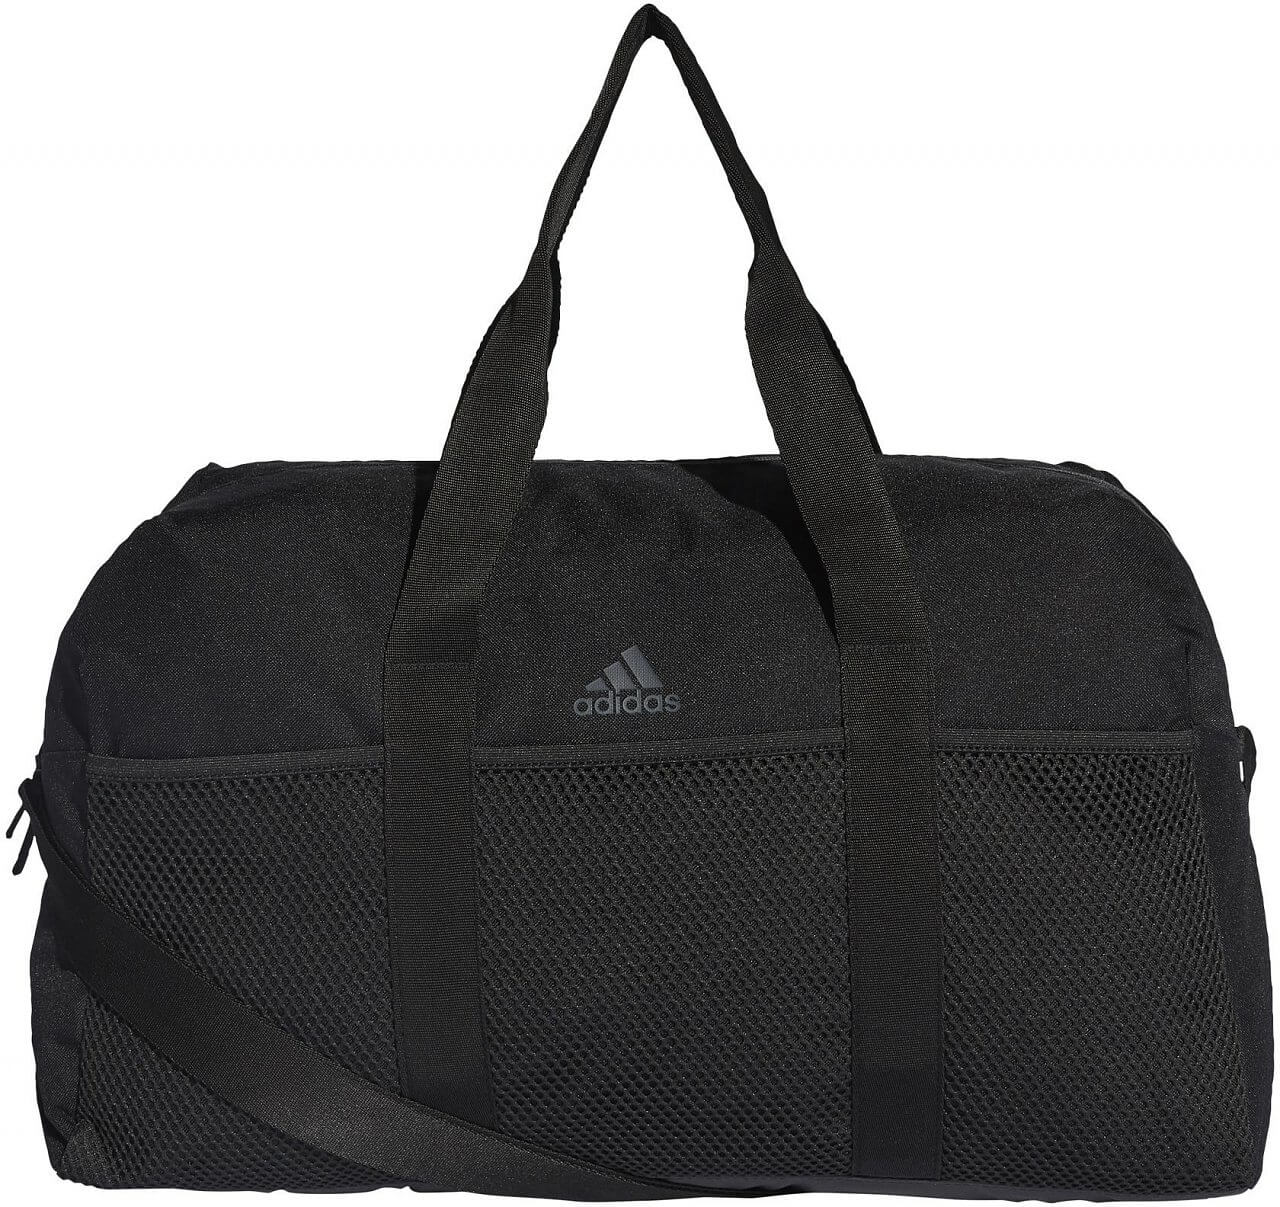 Sportovní taška adidas W Training Core Duffel M